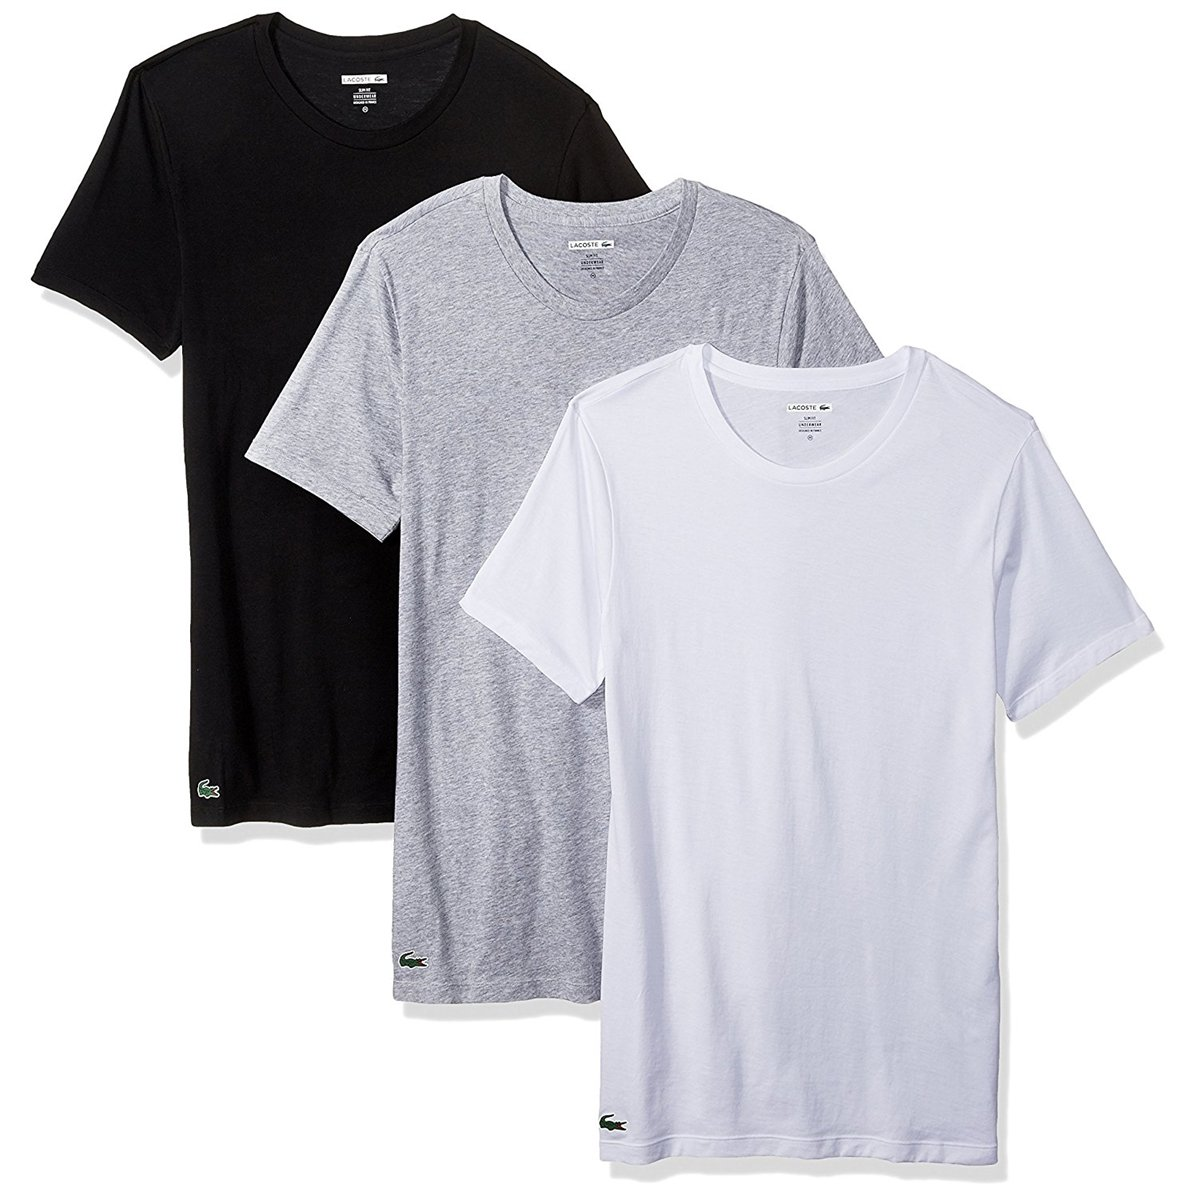 Lacoste Men's Slim Fit Cotton Crew Neck Tee, 3 Pk, Black/Grey/White, L by Lacoste